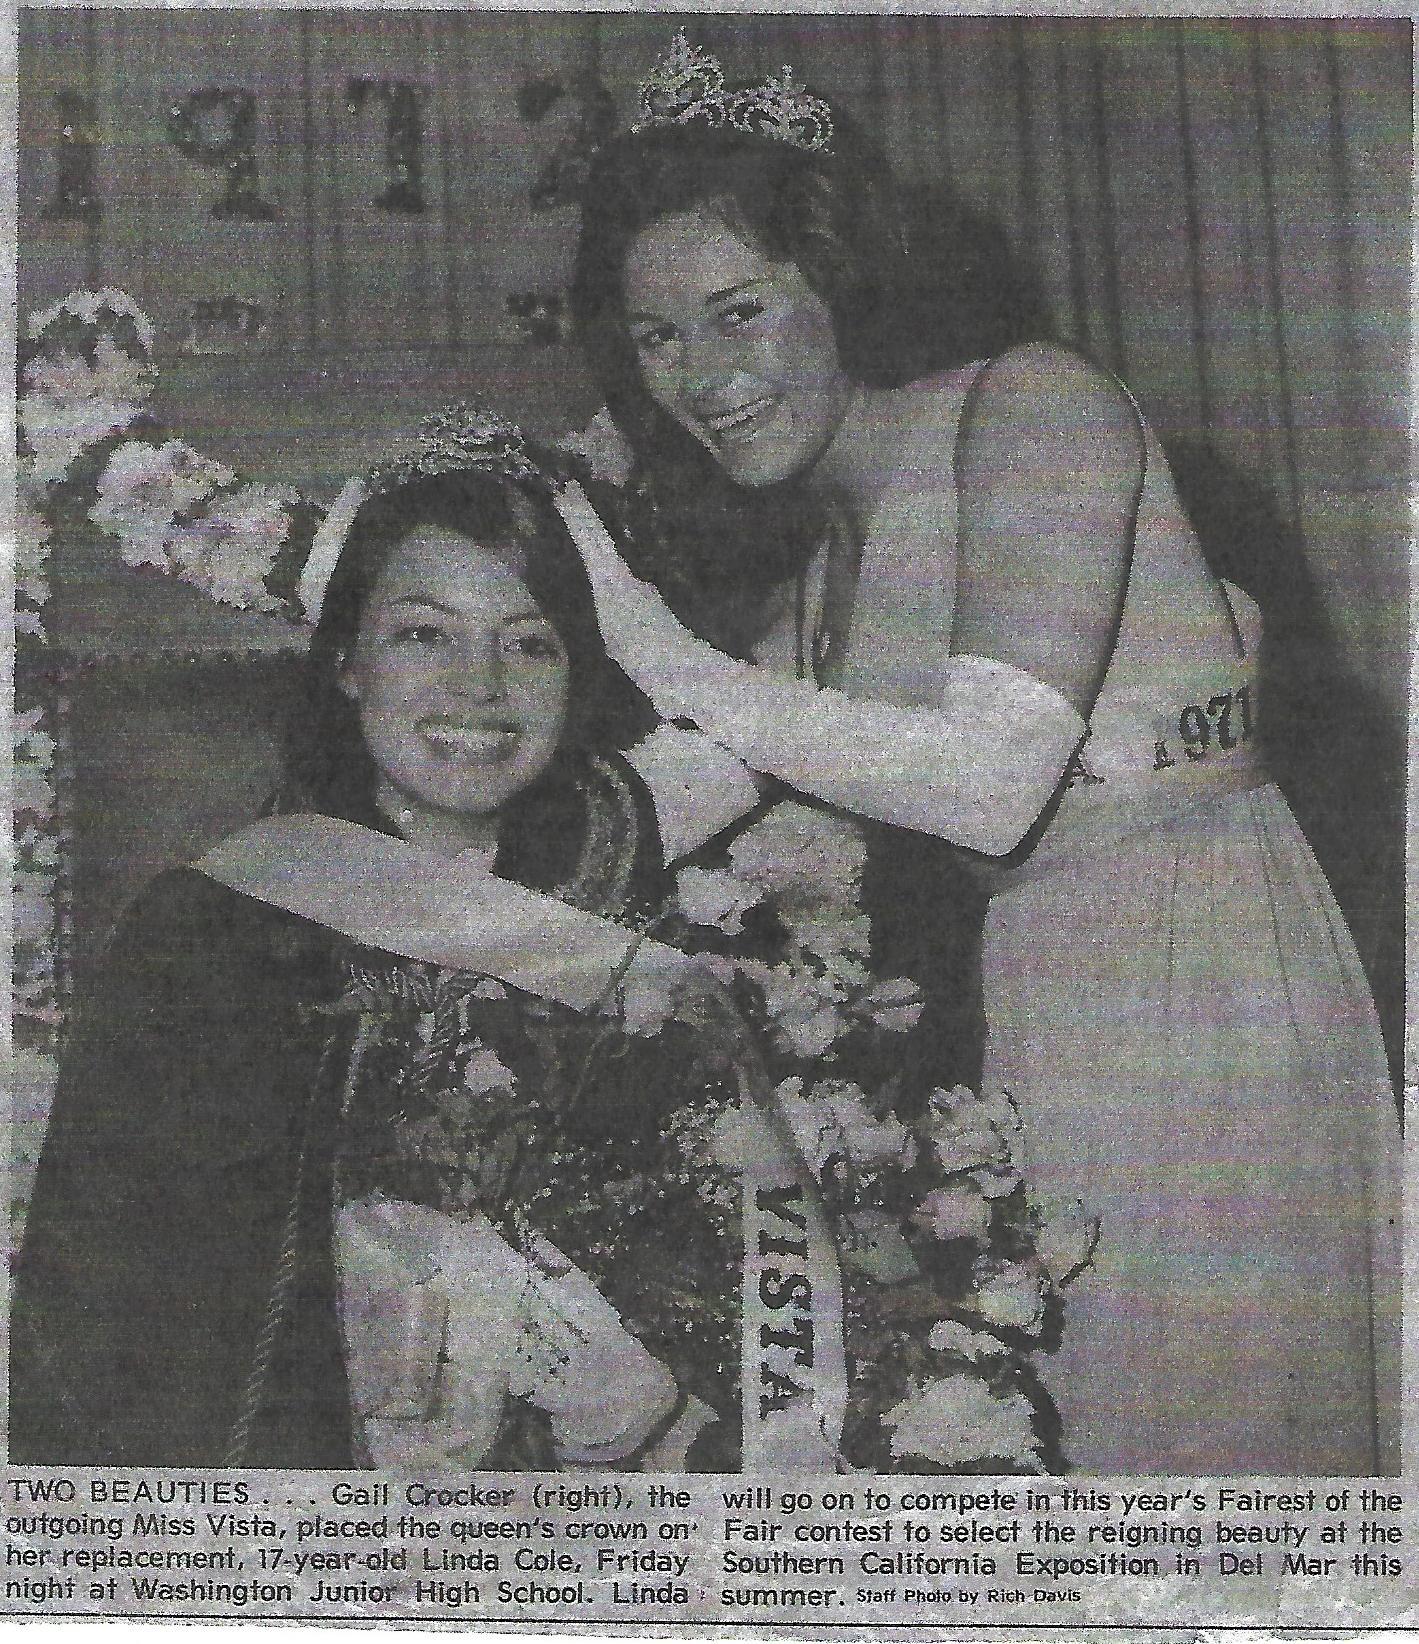 Linda Cole, Miss Vista 1972, and Gail Crocker, Miss Vista 1971